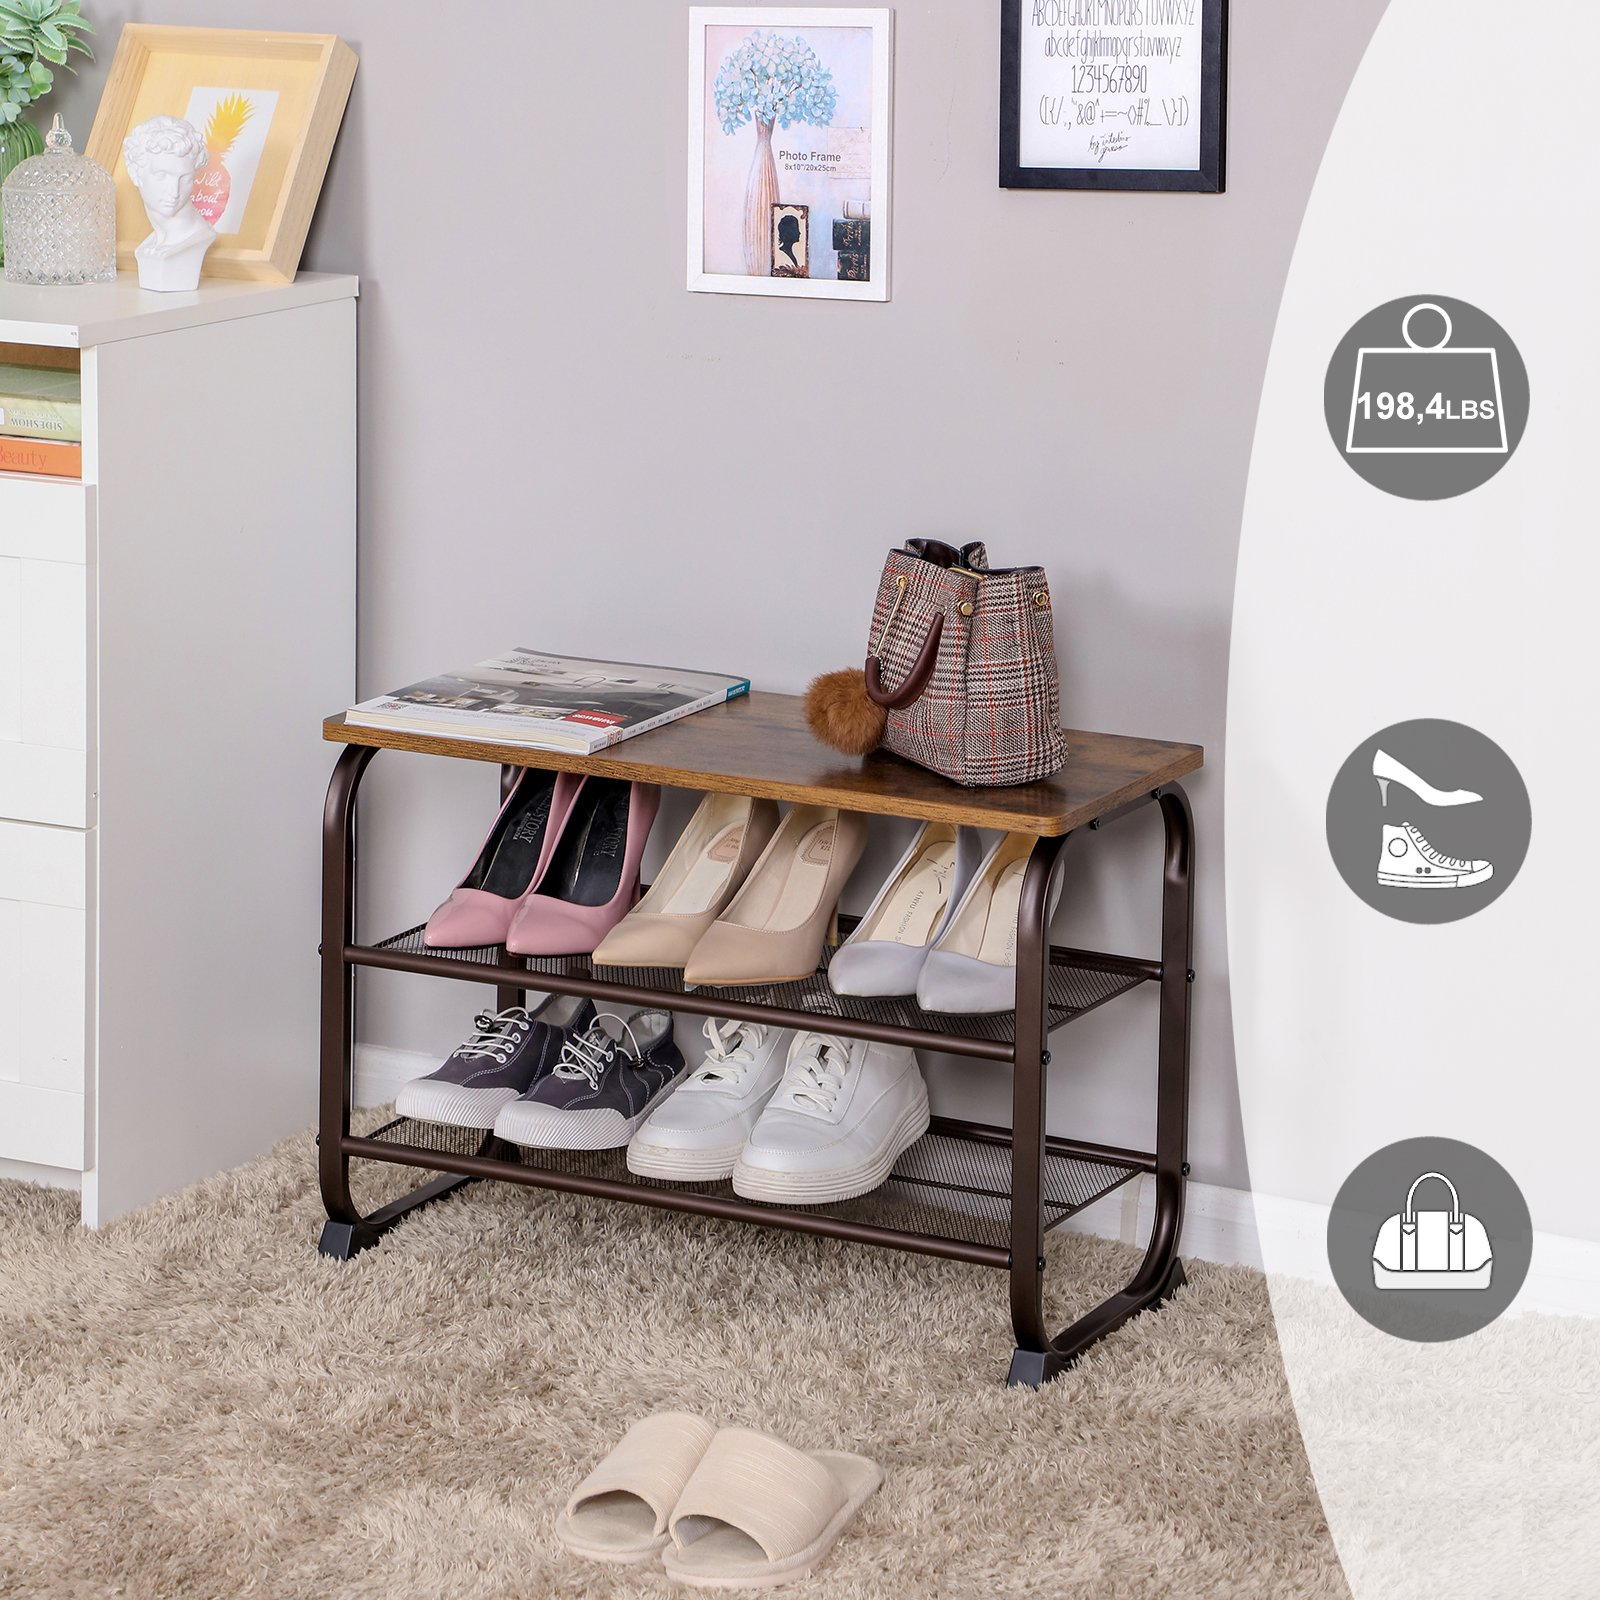 SONGMICS Vintage Shoe Bench Rack, 3-Tier Shoe Storage Shelf for